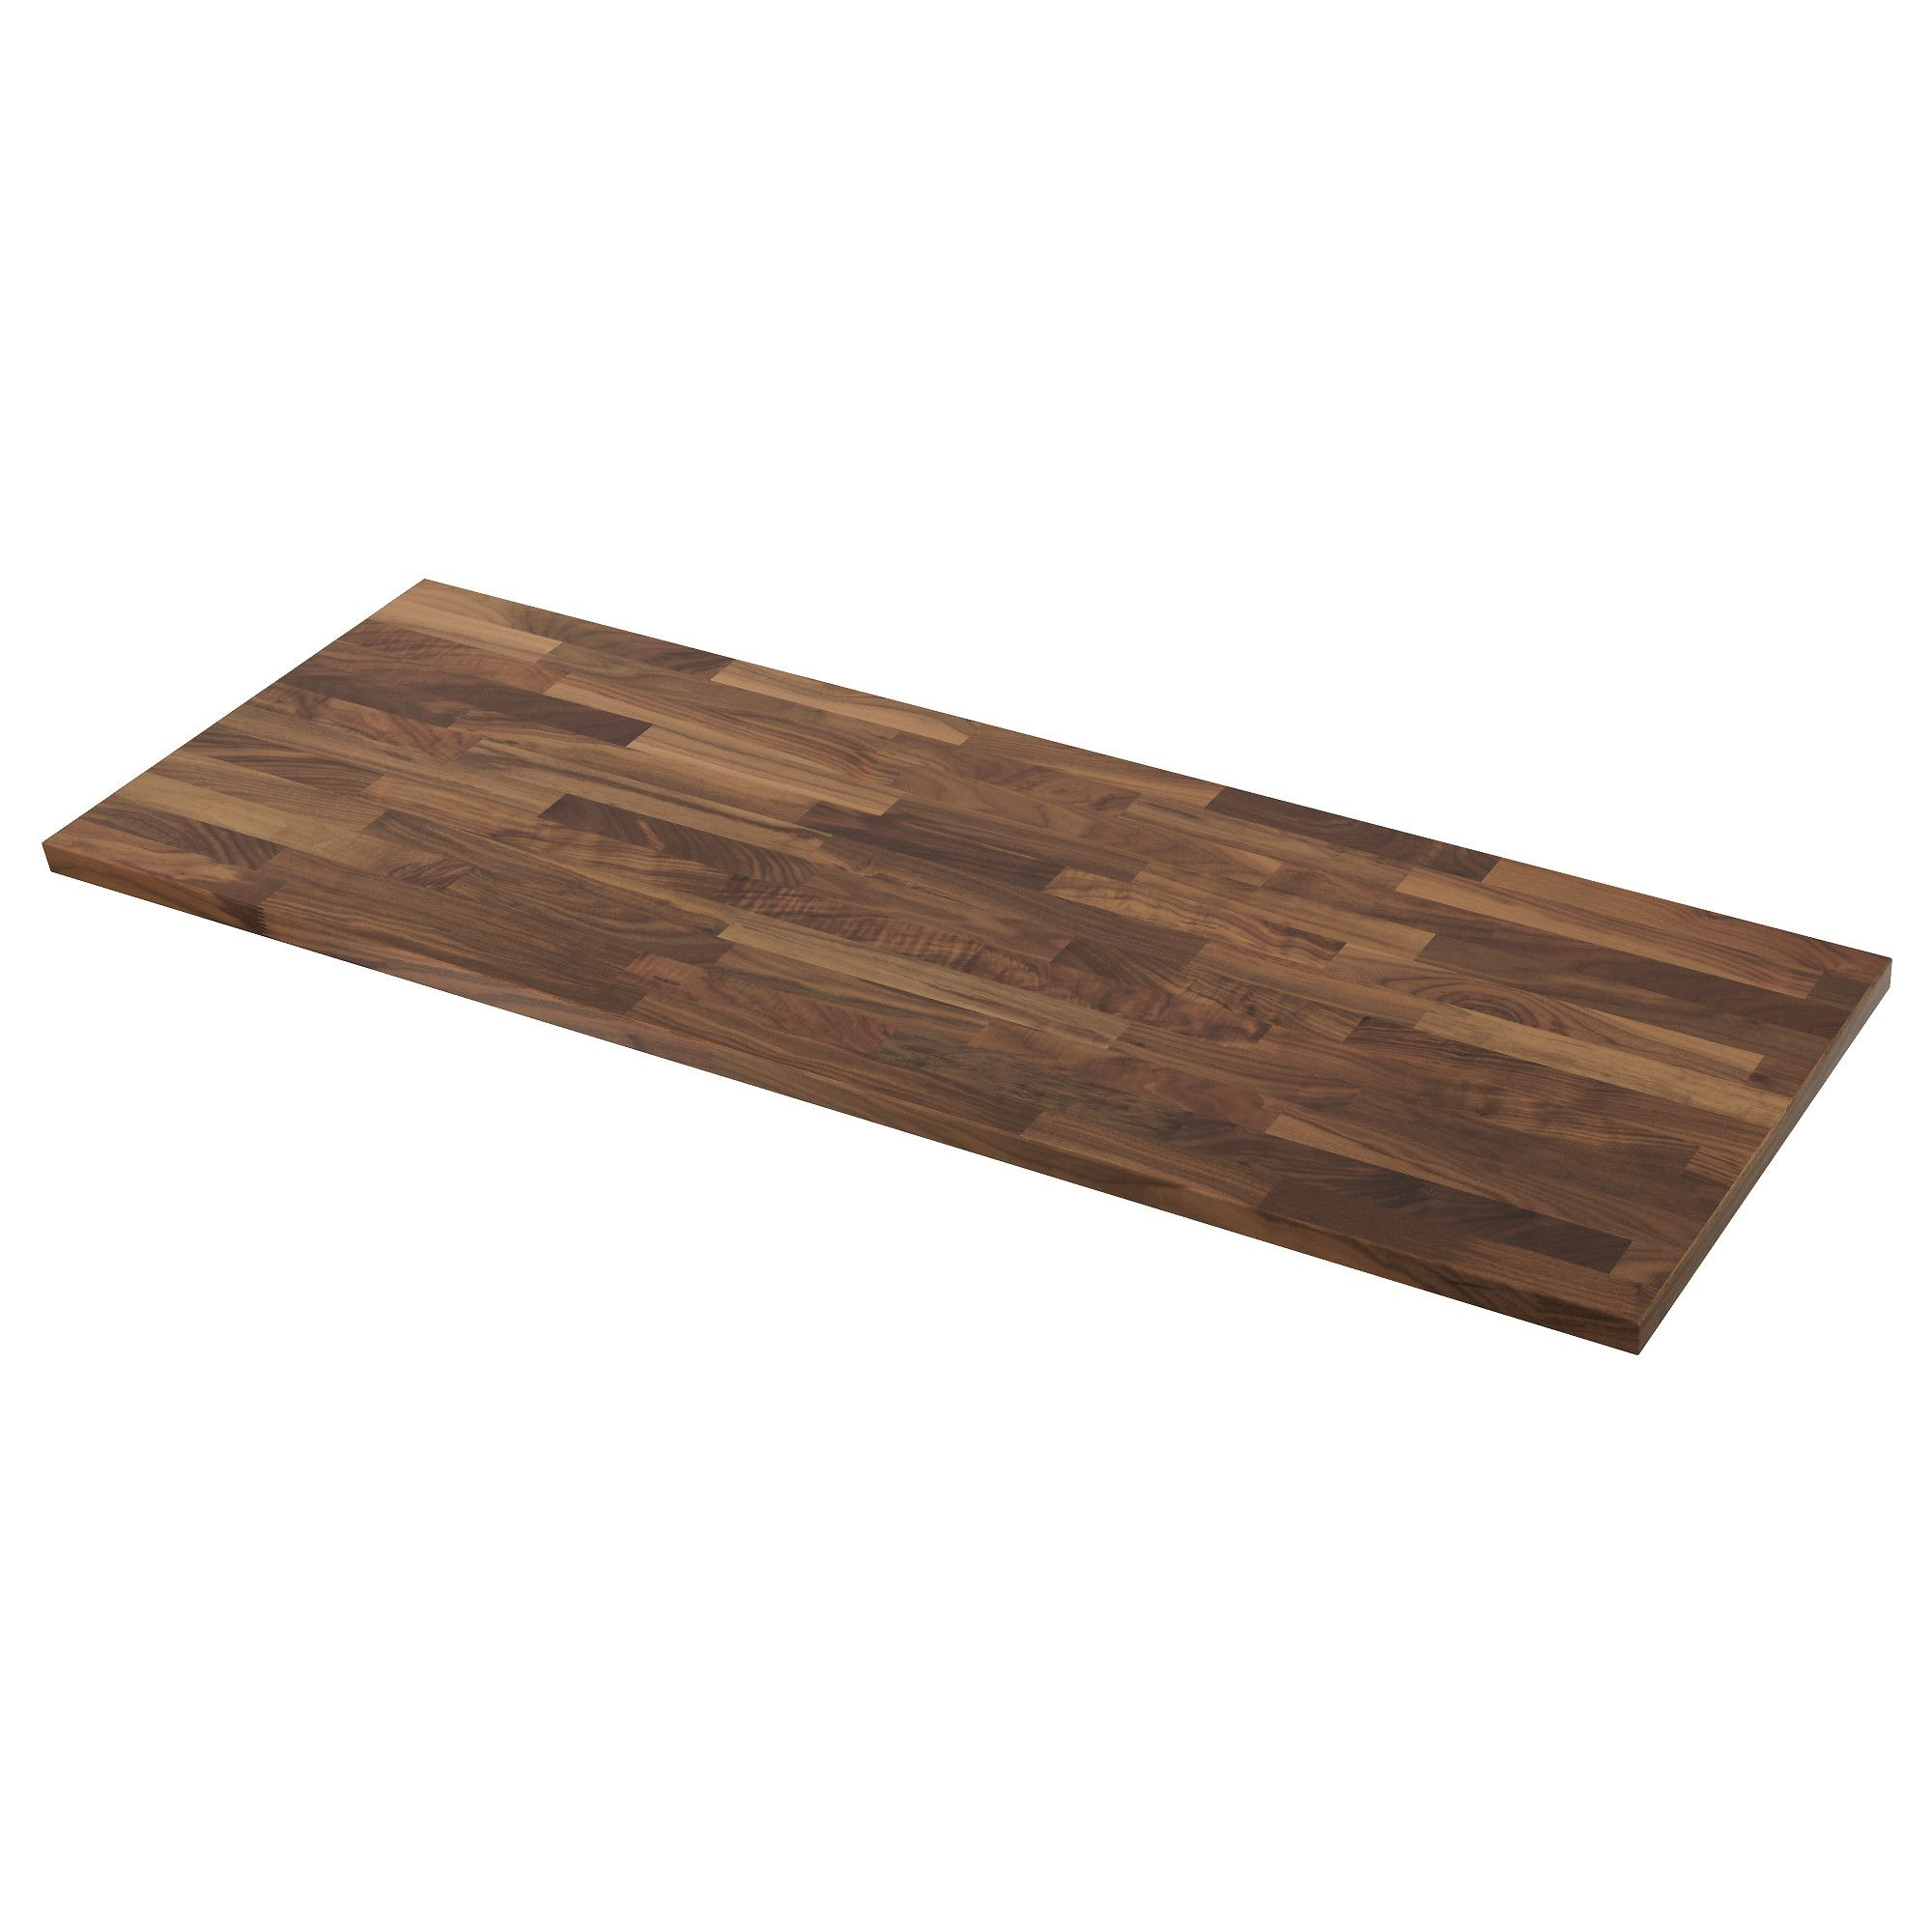 Ikea Us Furniture And Home Furnishings Karlby Countertop Replacing Kitchen Countertops Ikea Butcher Block